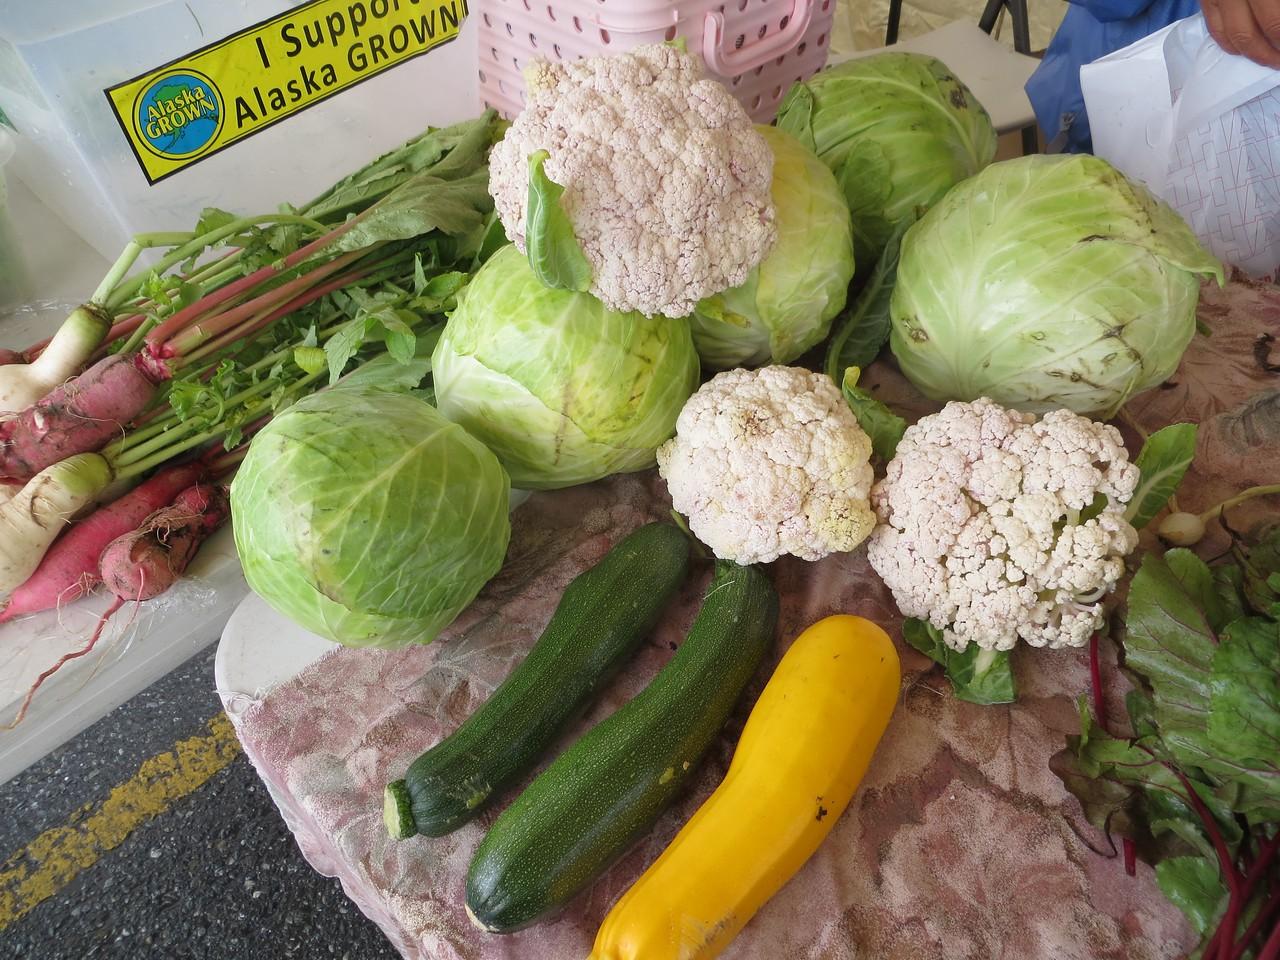 Vegetables for sale at farmers market